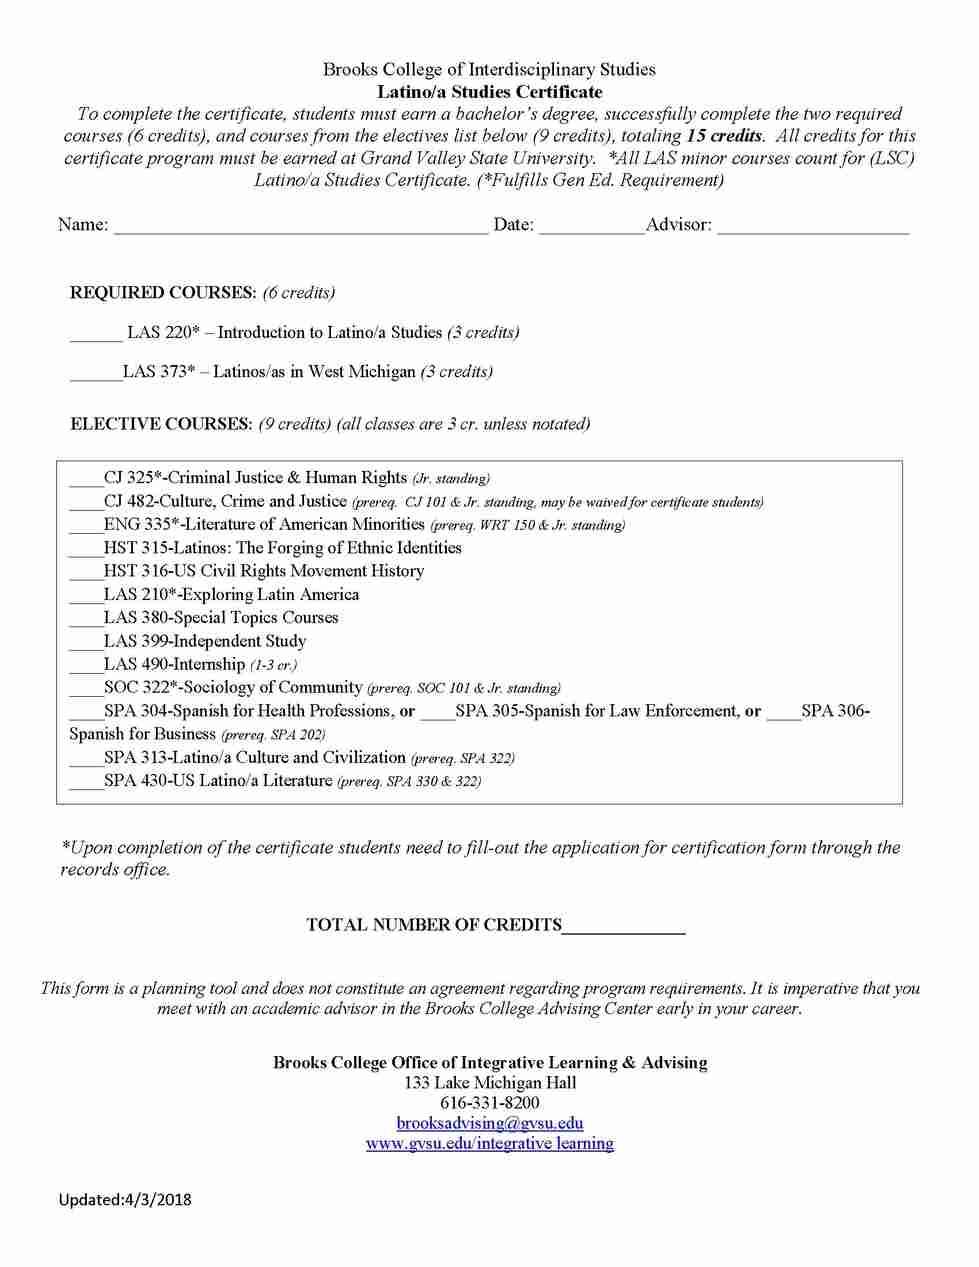 Latinoa Studies Certificate Grand Valley State University